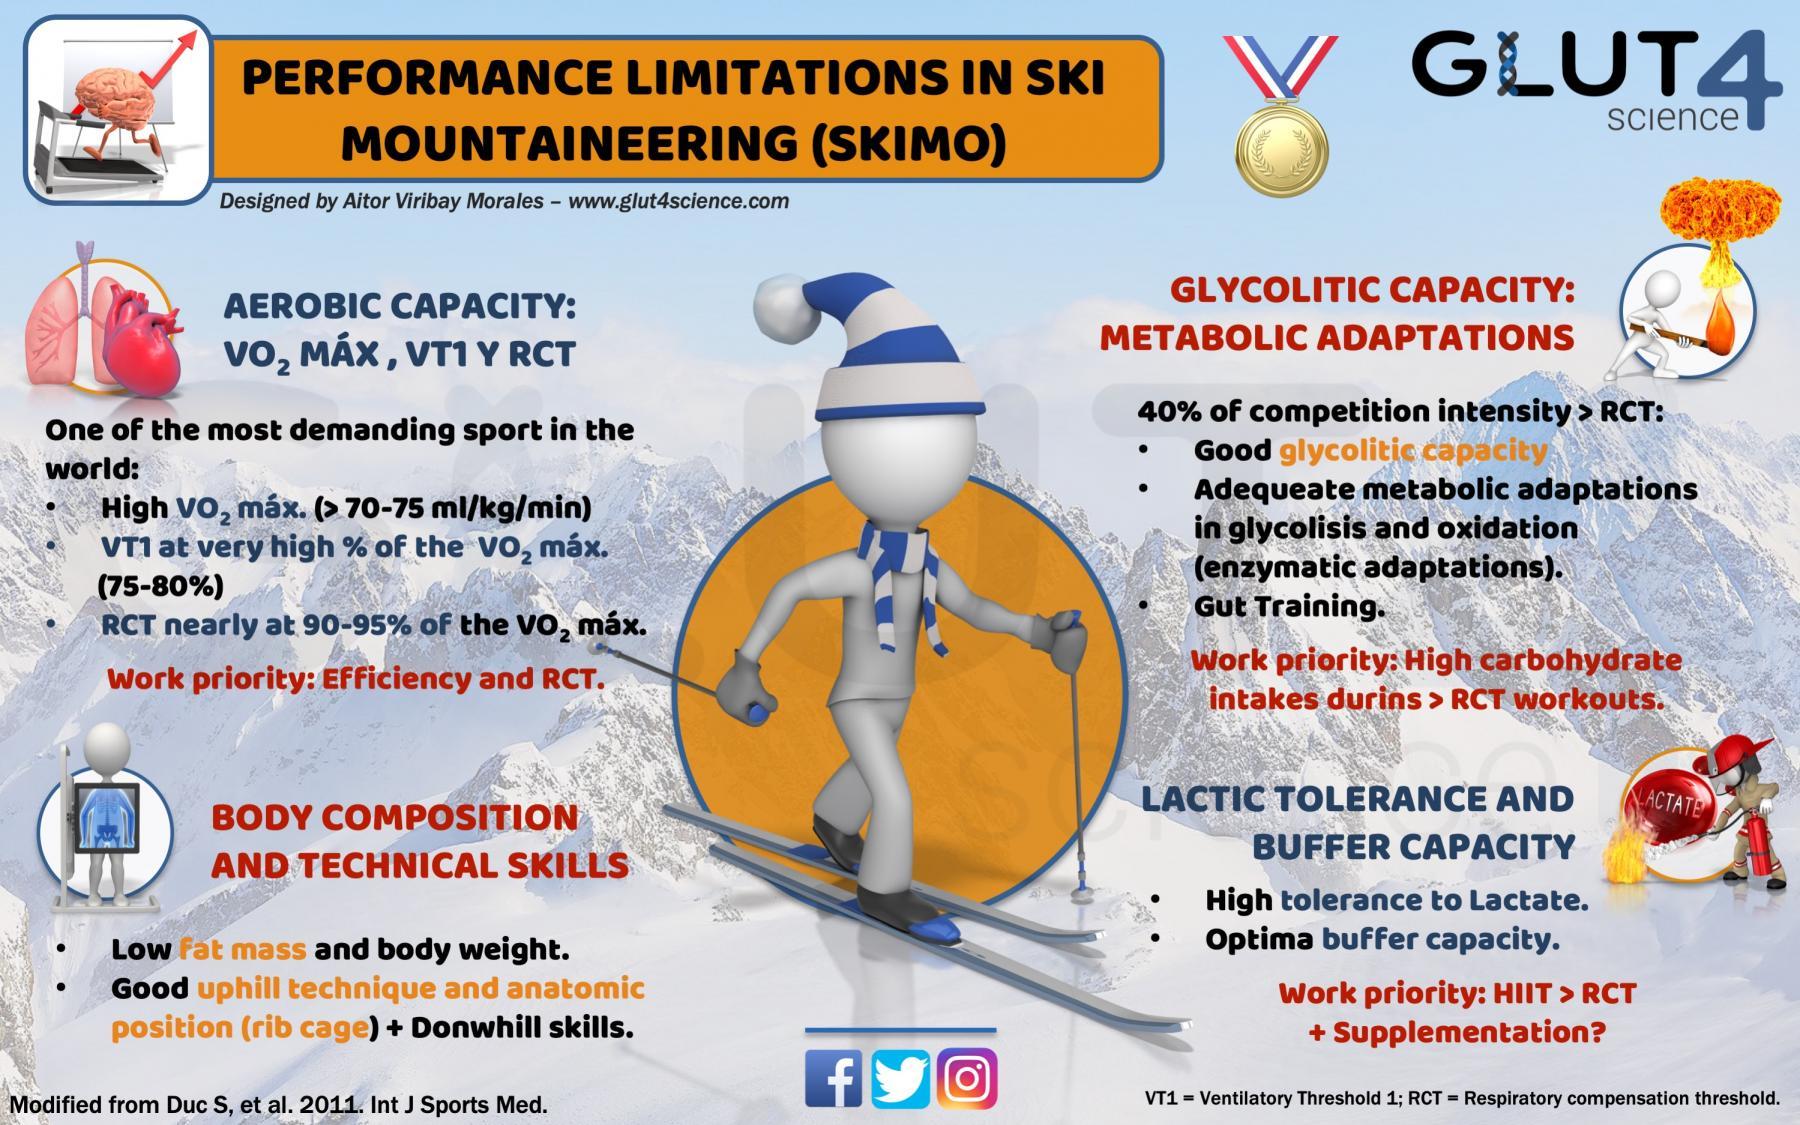 Performance Limitations in Ski Mountaineering SKIMO